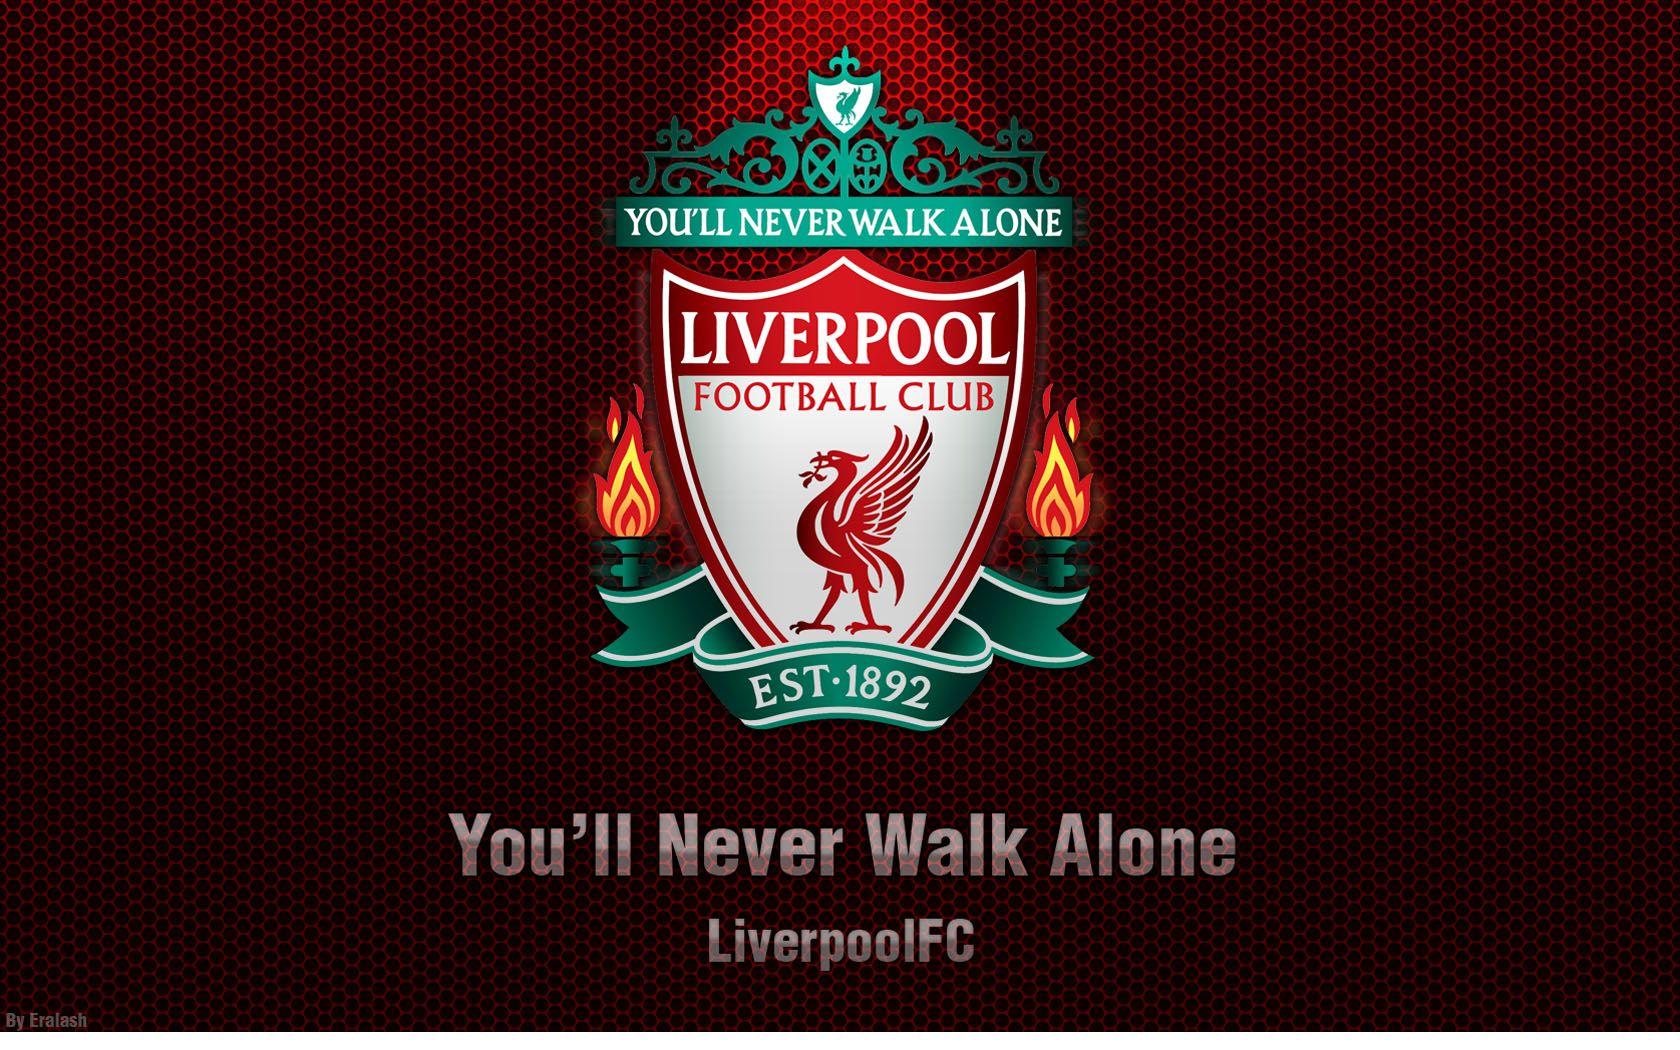 Liverpool Football Club Logo Wallpaper Iphone 5s